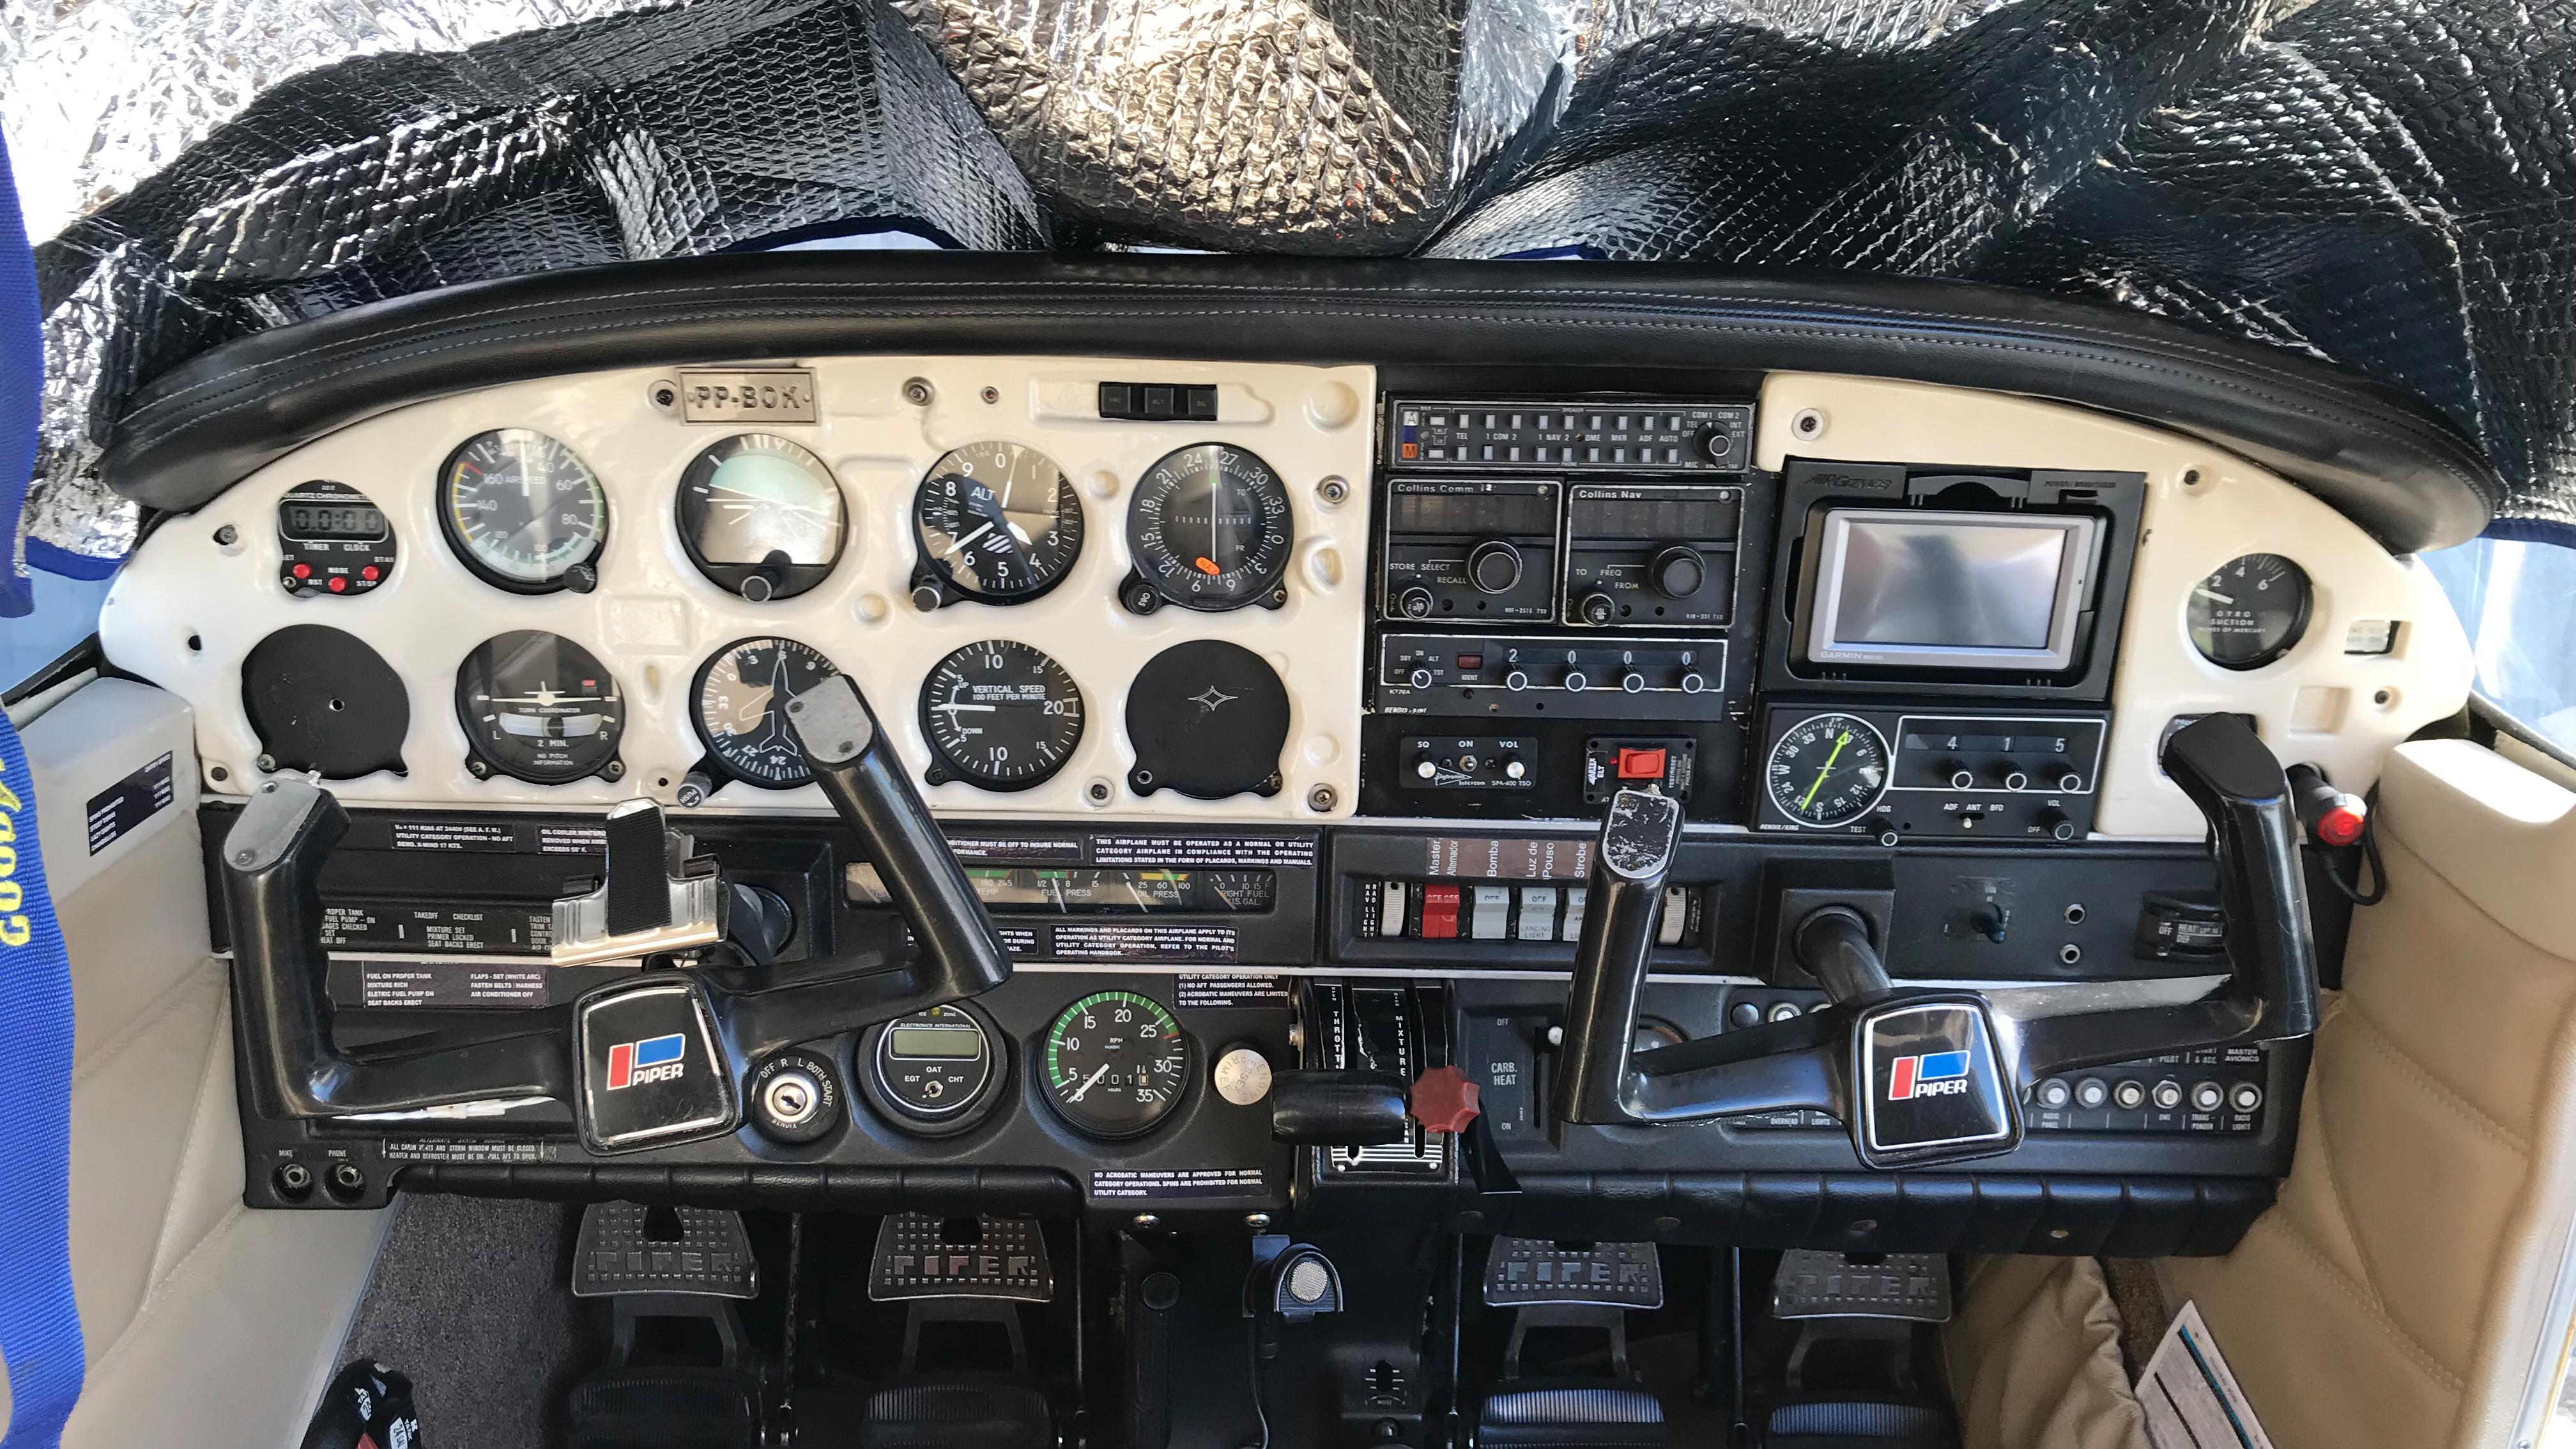 Ground School Embraer 712 - Tupi (P28A)